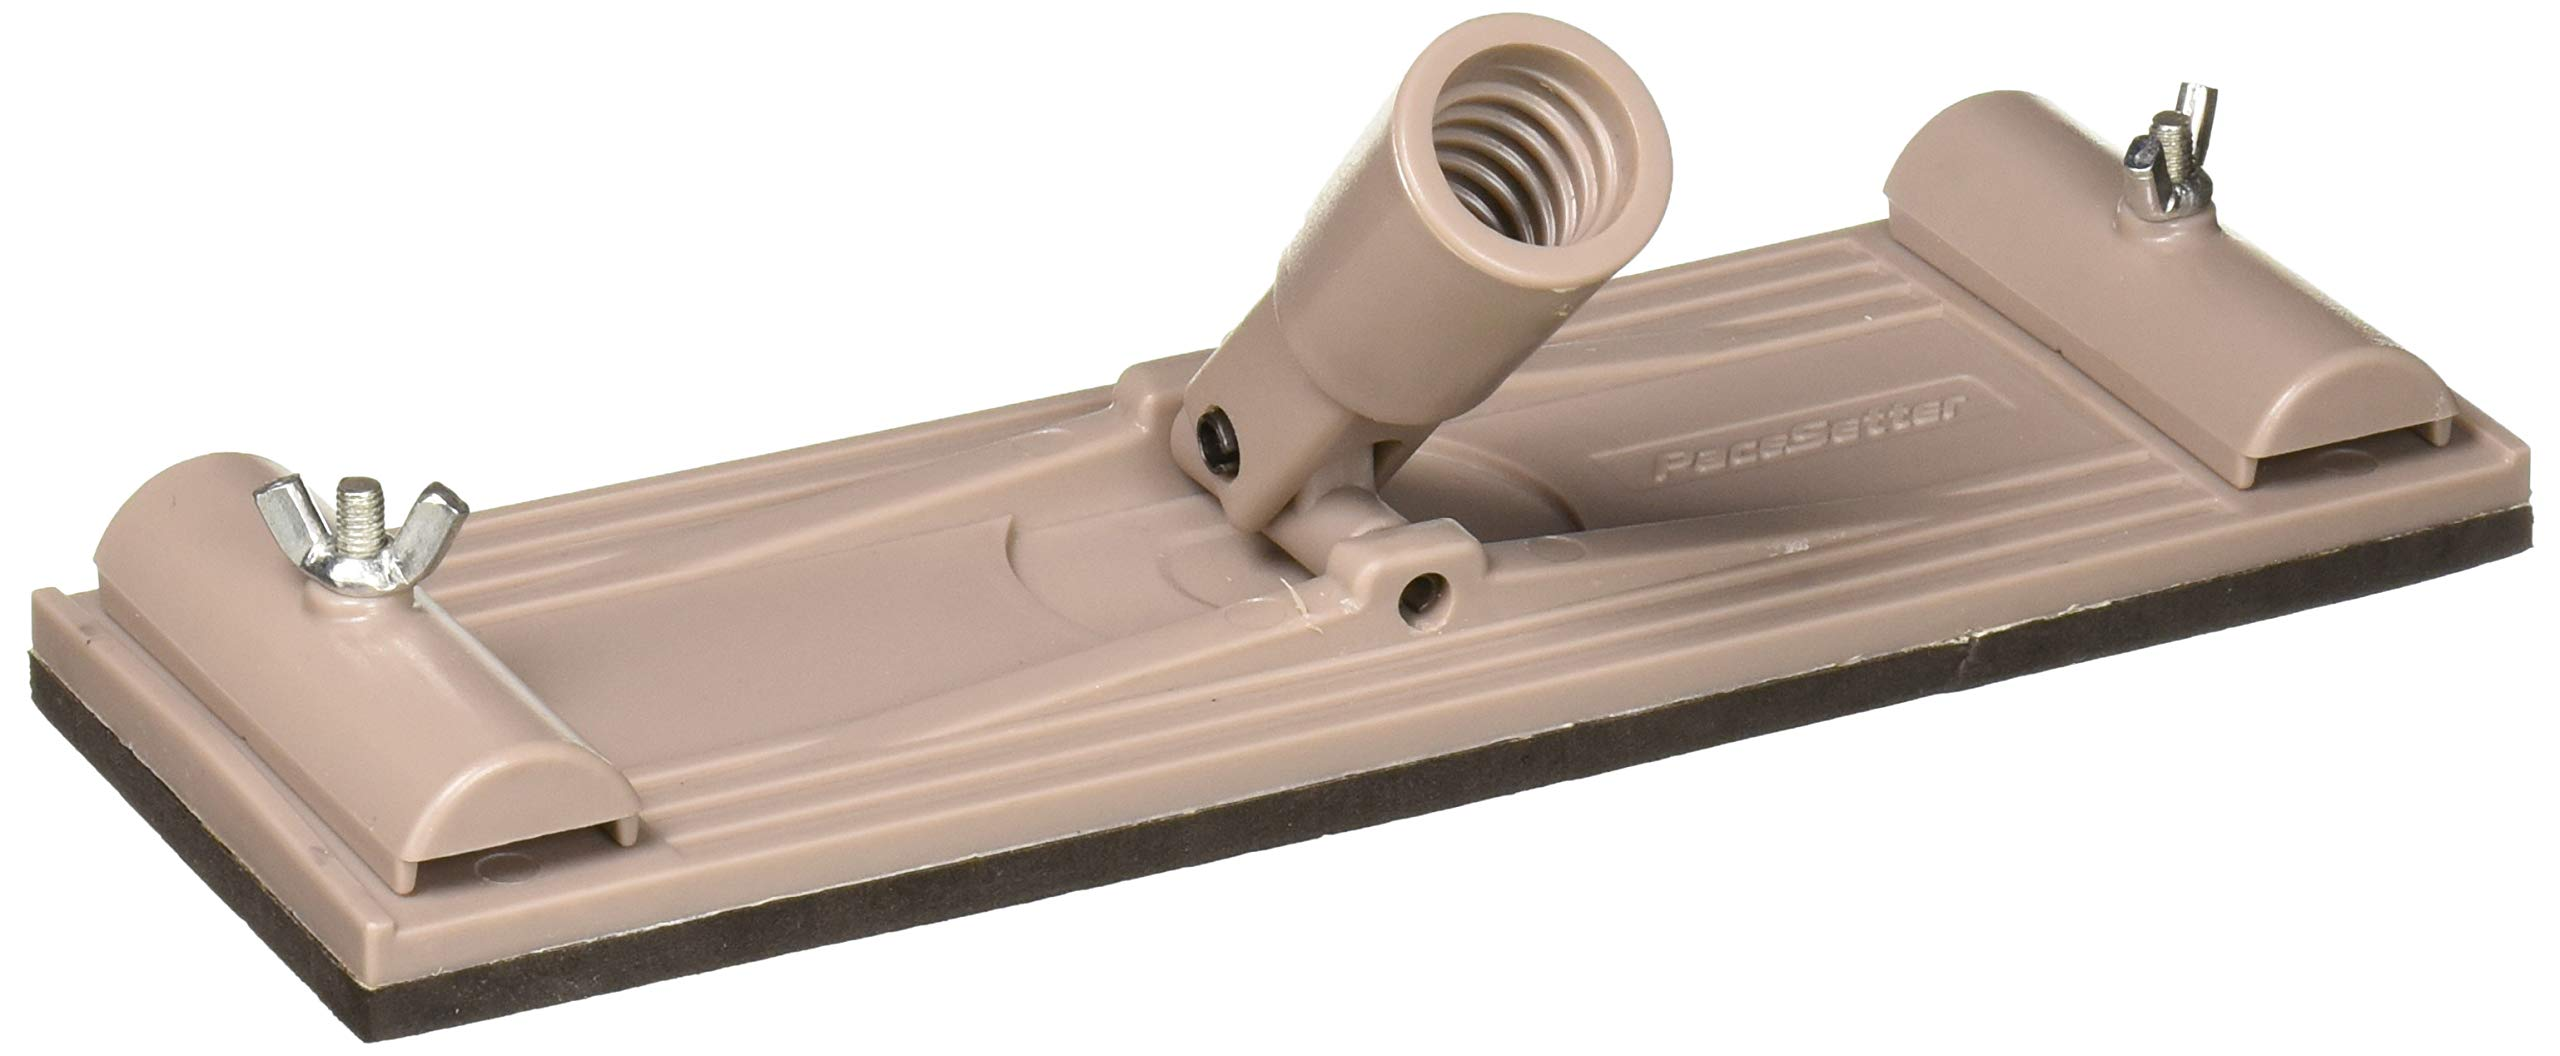 PaceSetter by Goldblatt G15355 Plastic Pole Sander Head